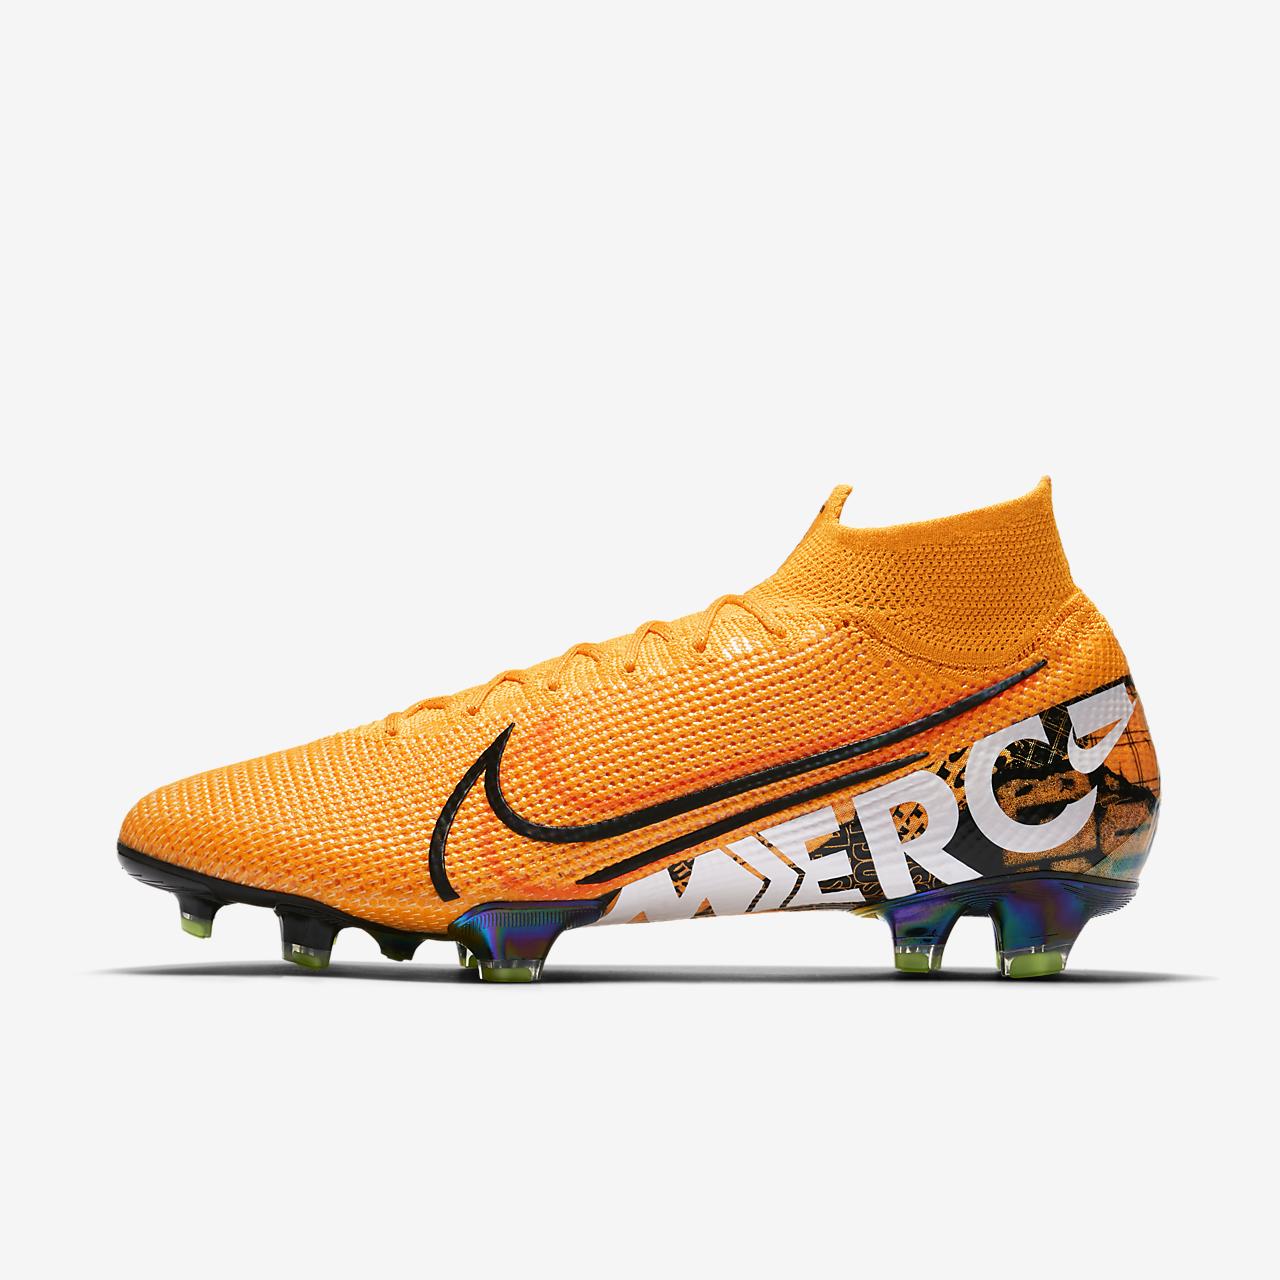 Mercurial À Crampons Football De Nike Terrain Chaussure Sec Pour UqMzVSp